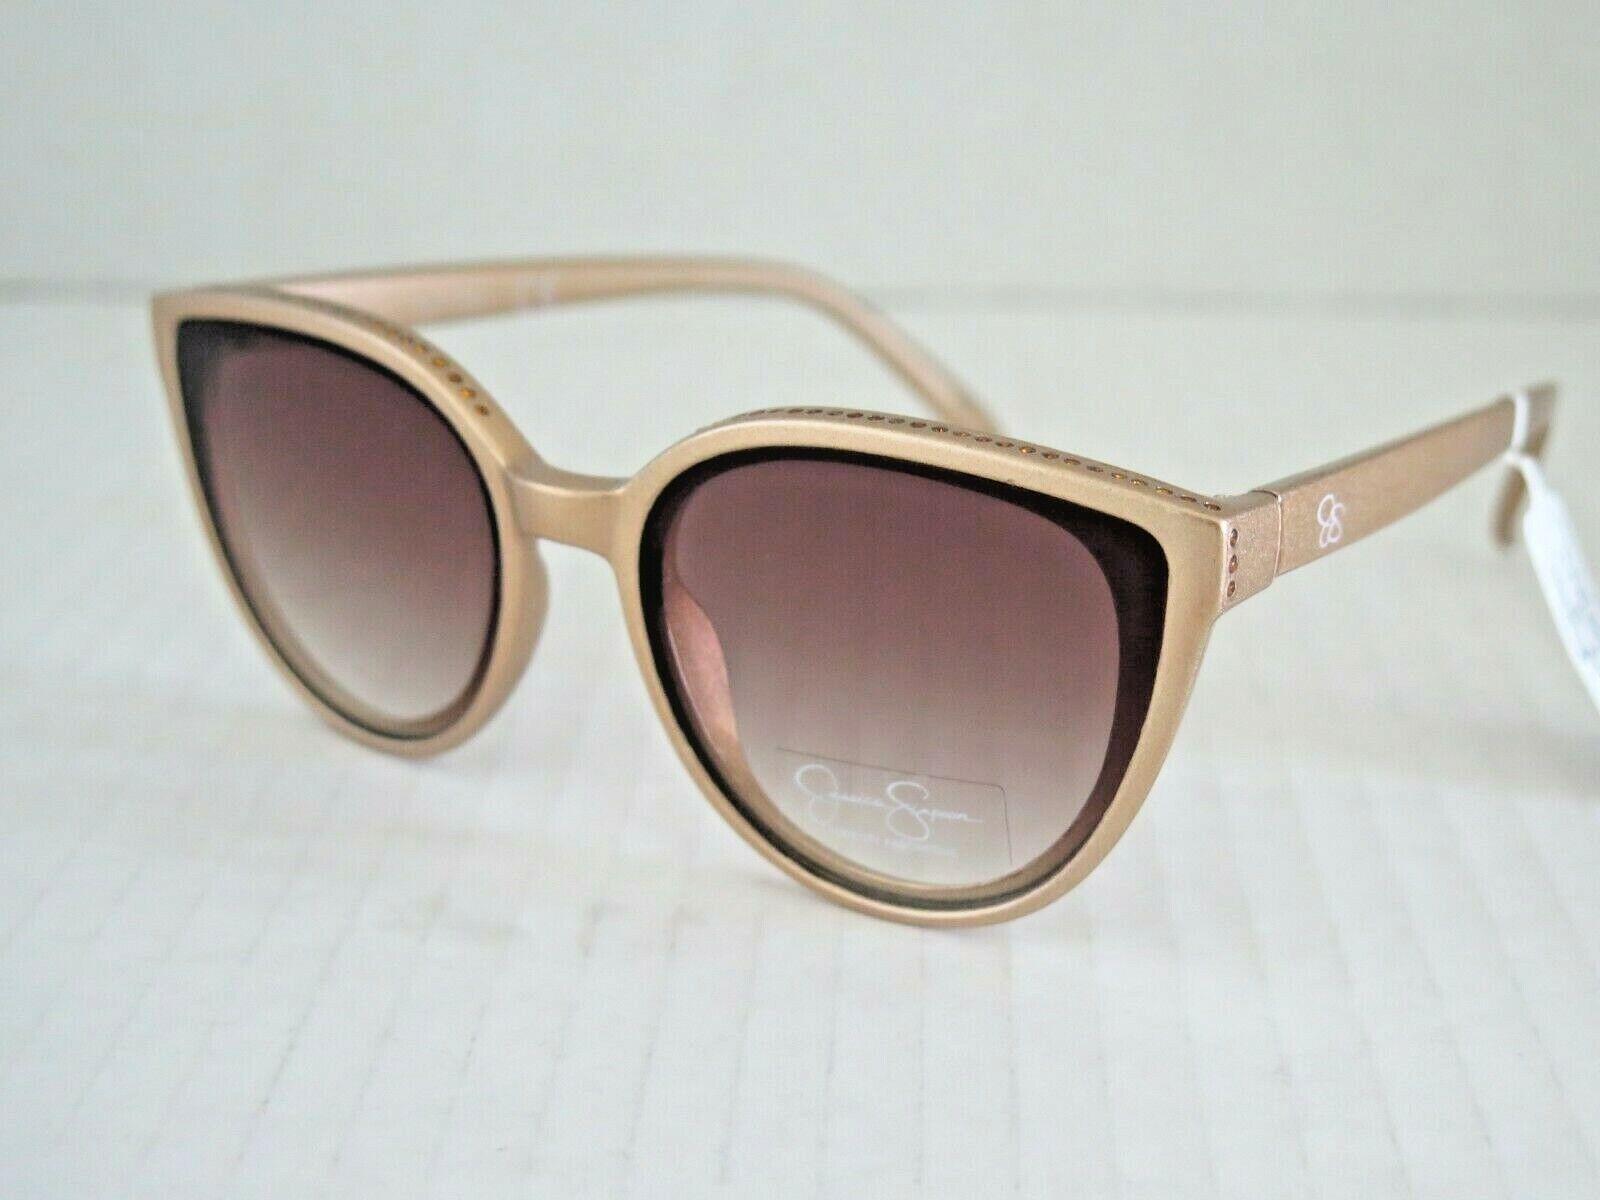 JESSICA SIMPSON J5961 CP CAT EYE Matte Gold Black Womens Sunglasses +